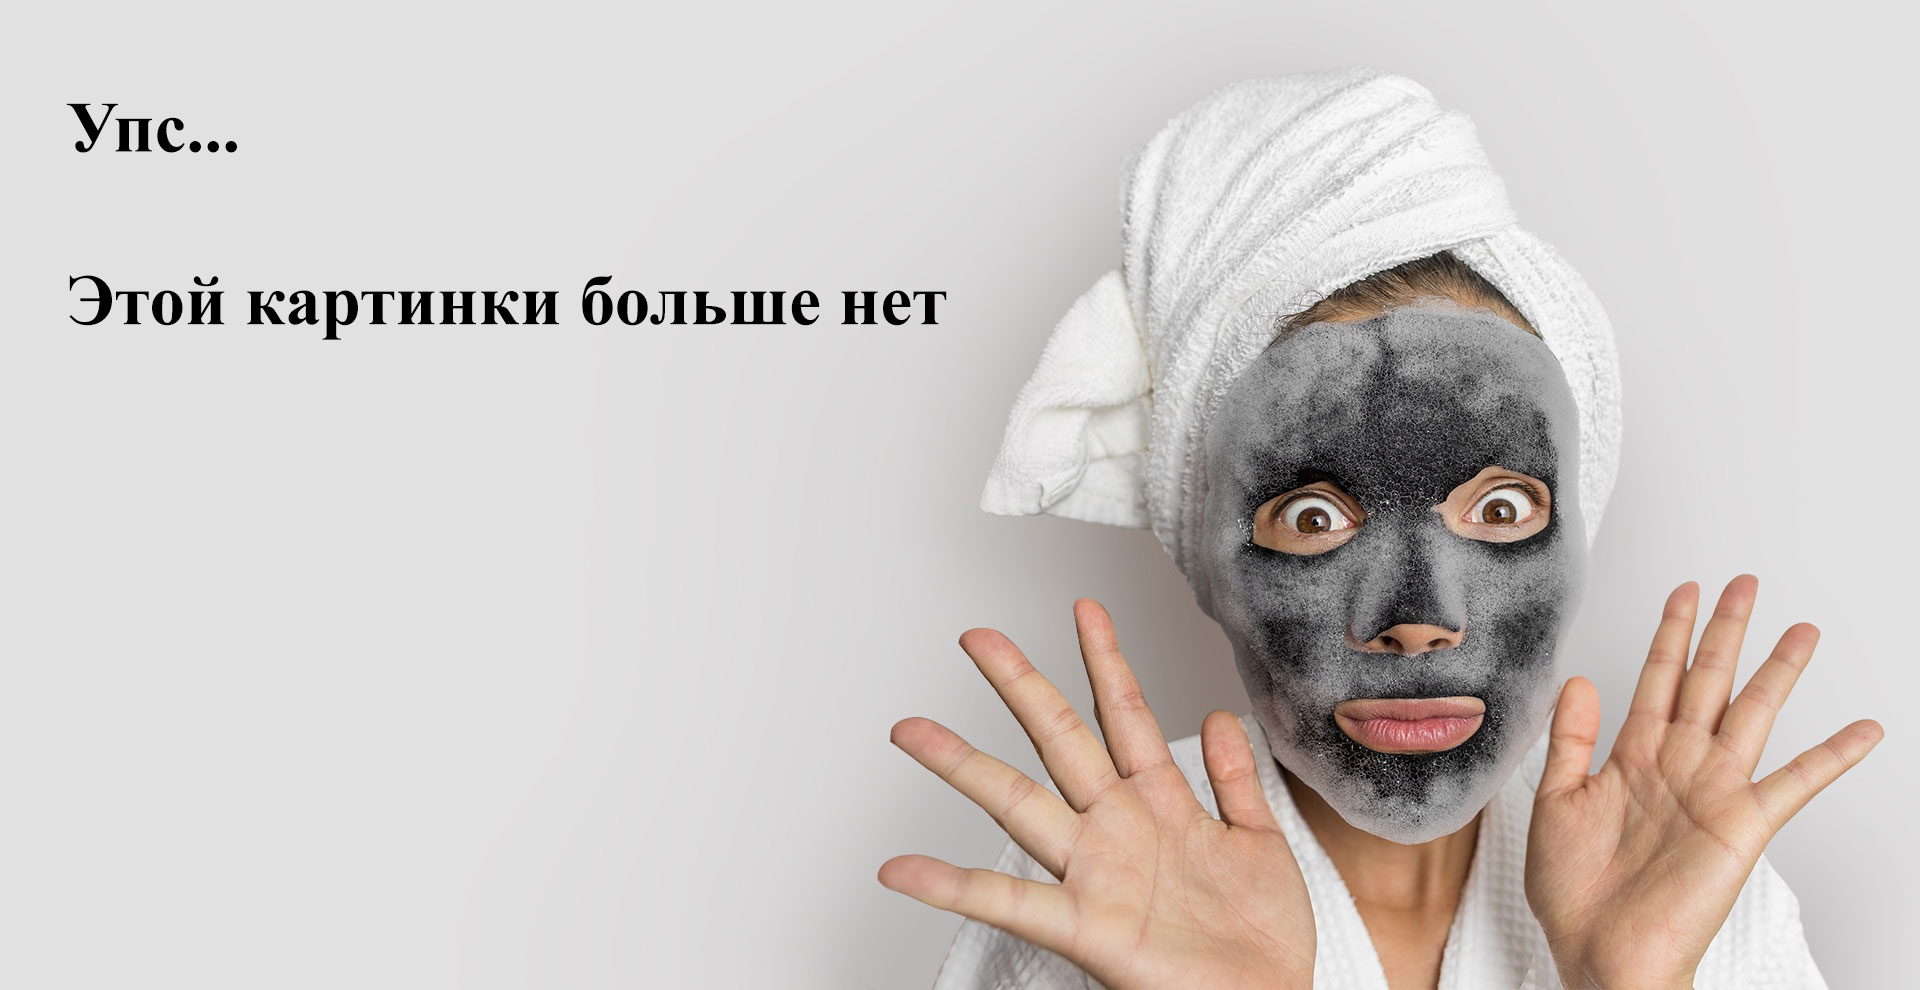 Patrisa Nail, Гель-лак Московская сага №766